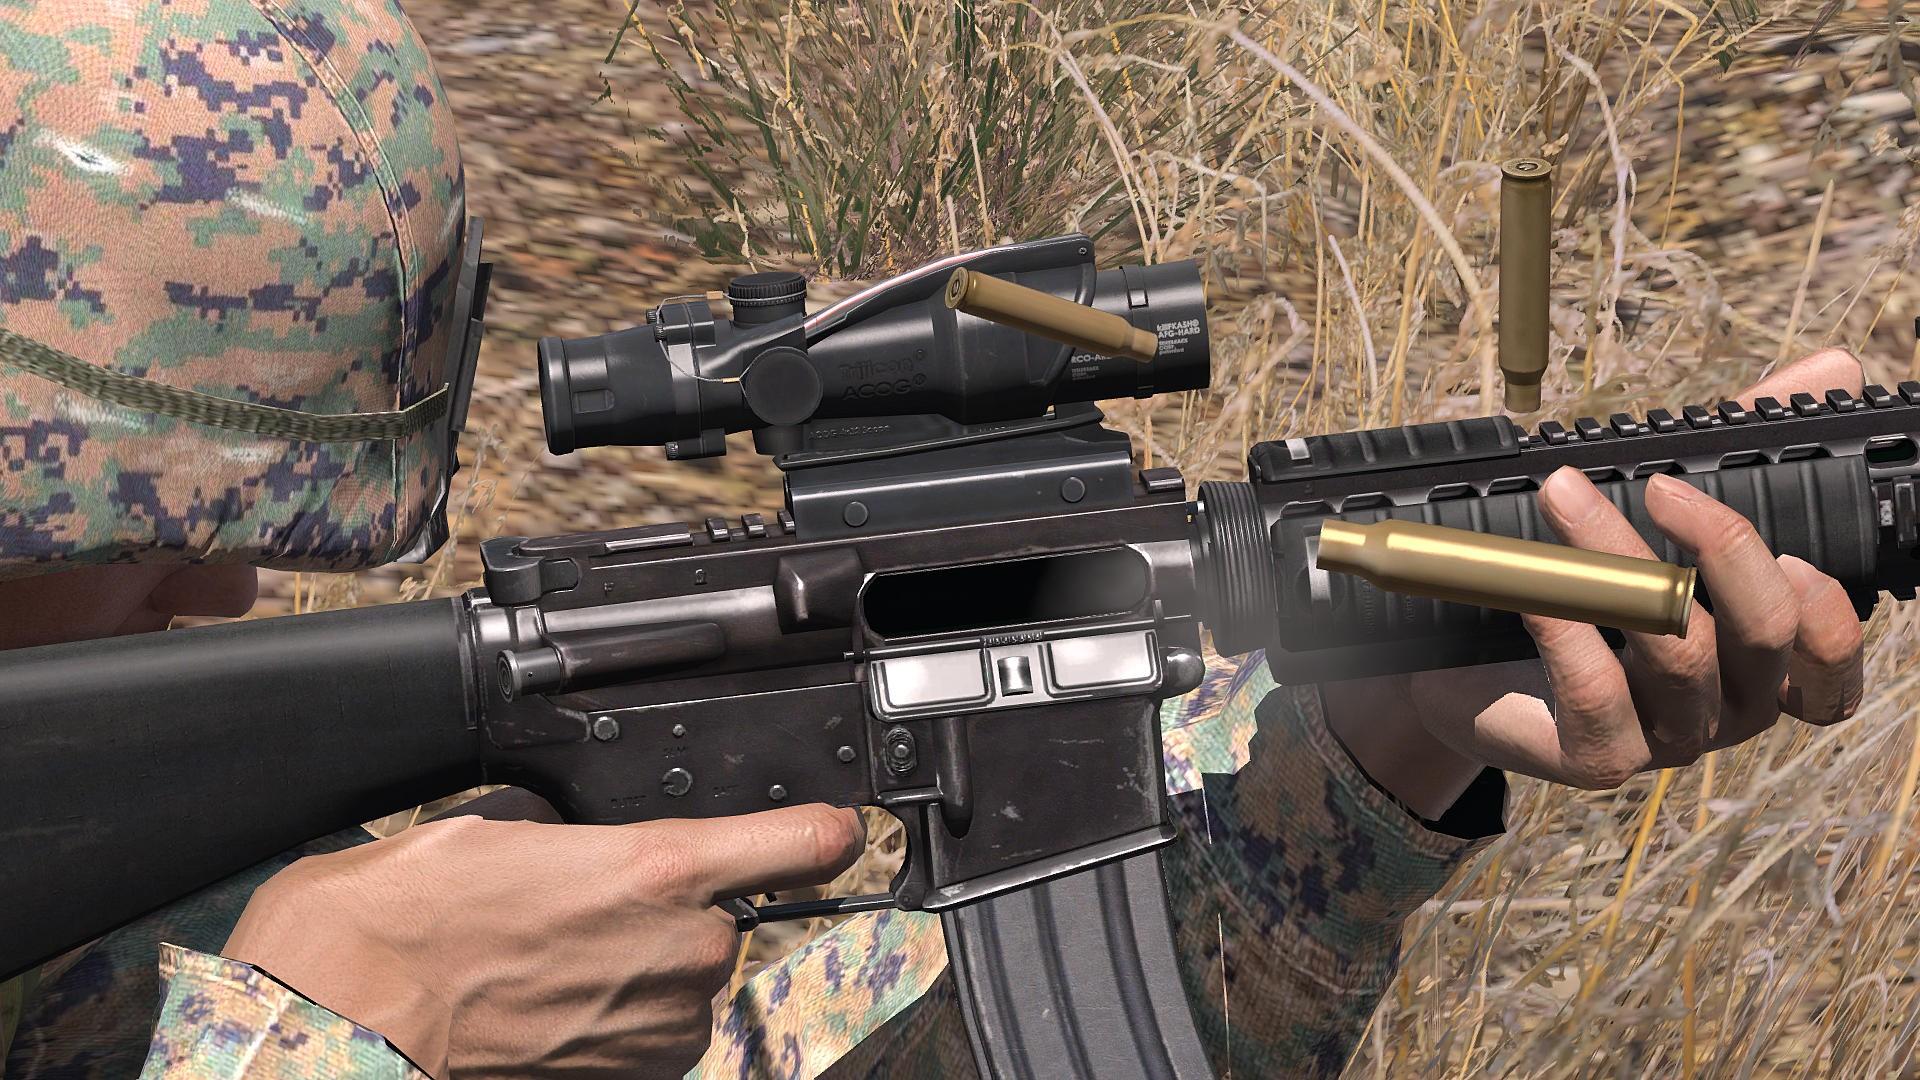 VTN | Make Arma Not War